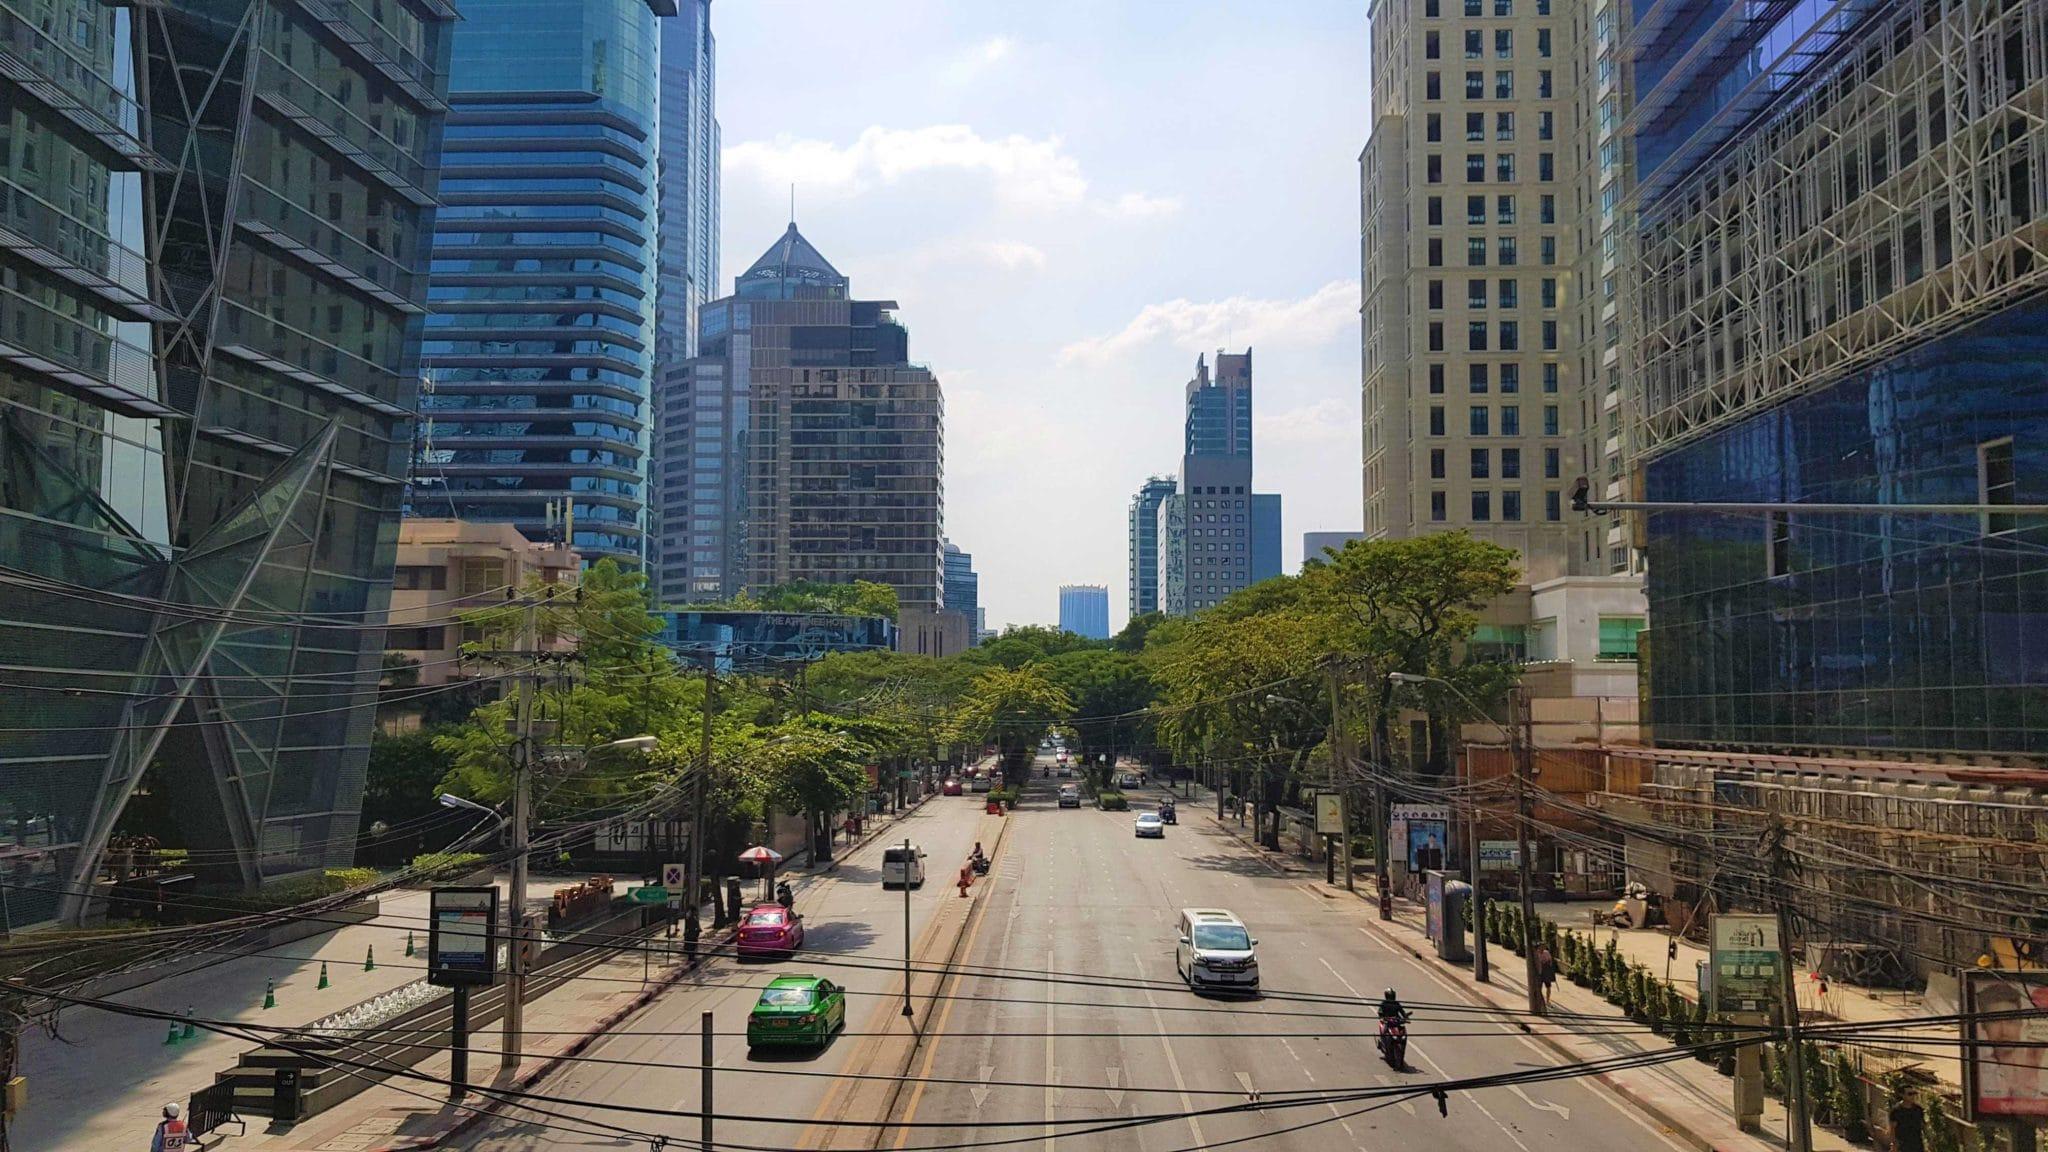 Timeless Investment  ซอยหลังสวน ที่สุดแห่งทำเลอันทรงคุณค่าเหนือกาลเวลา | Prop2Morrow บ้าน คอนโด ข่าวอสังหาฯ